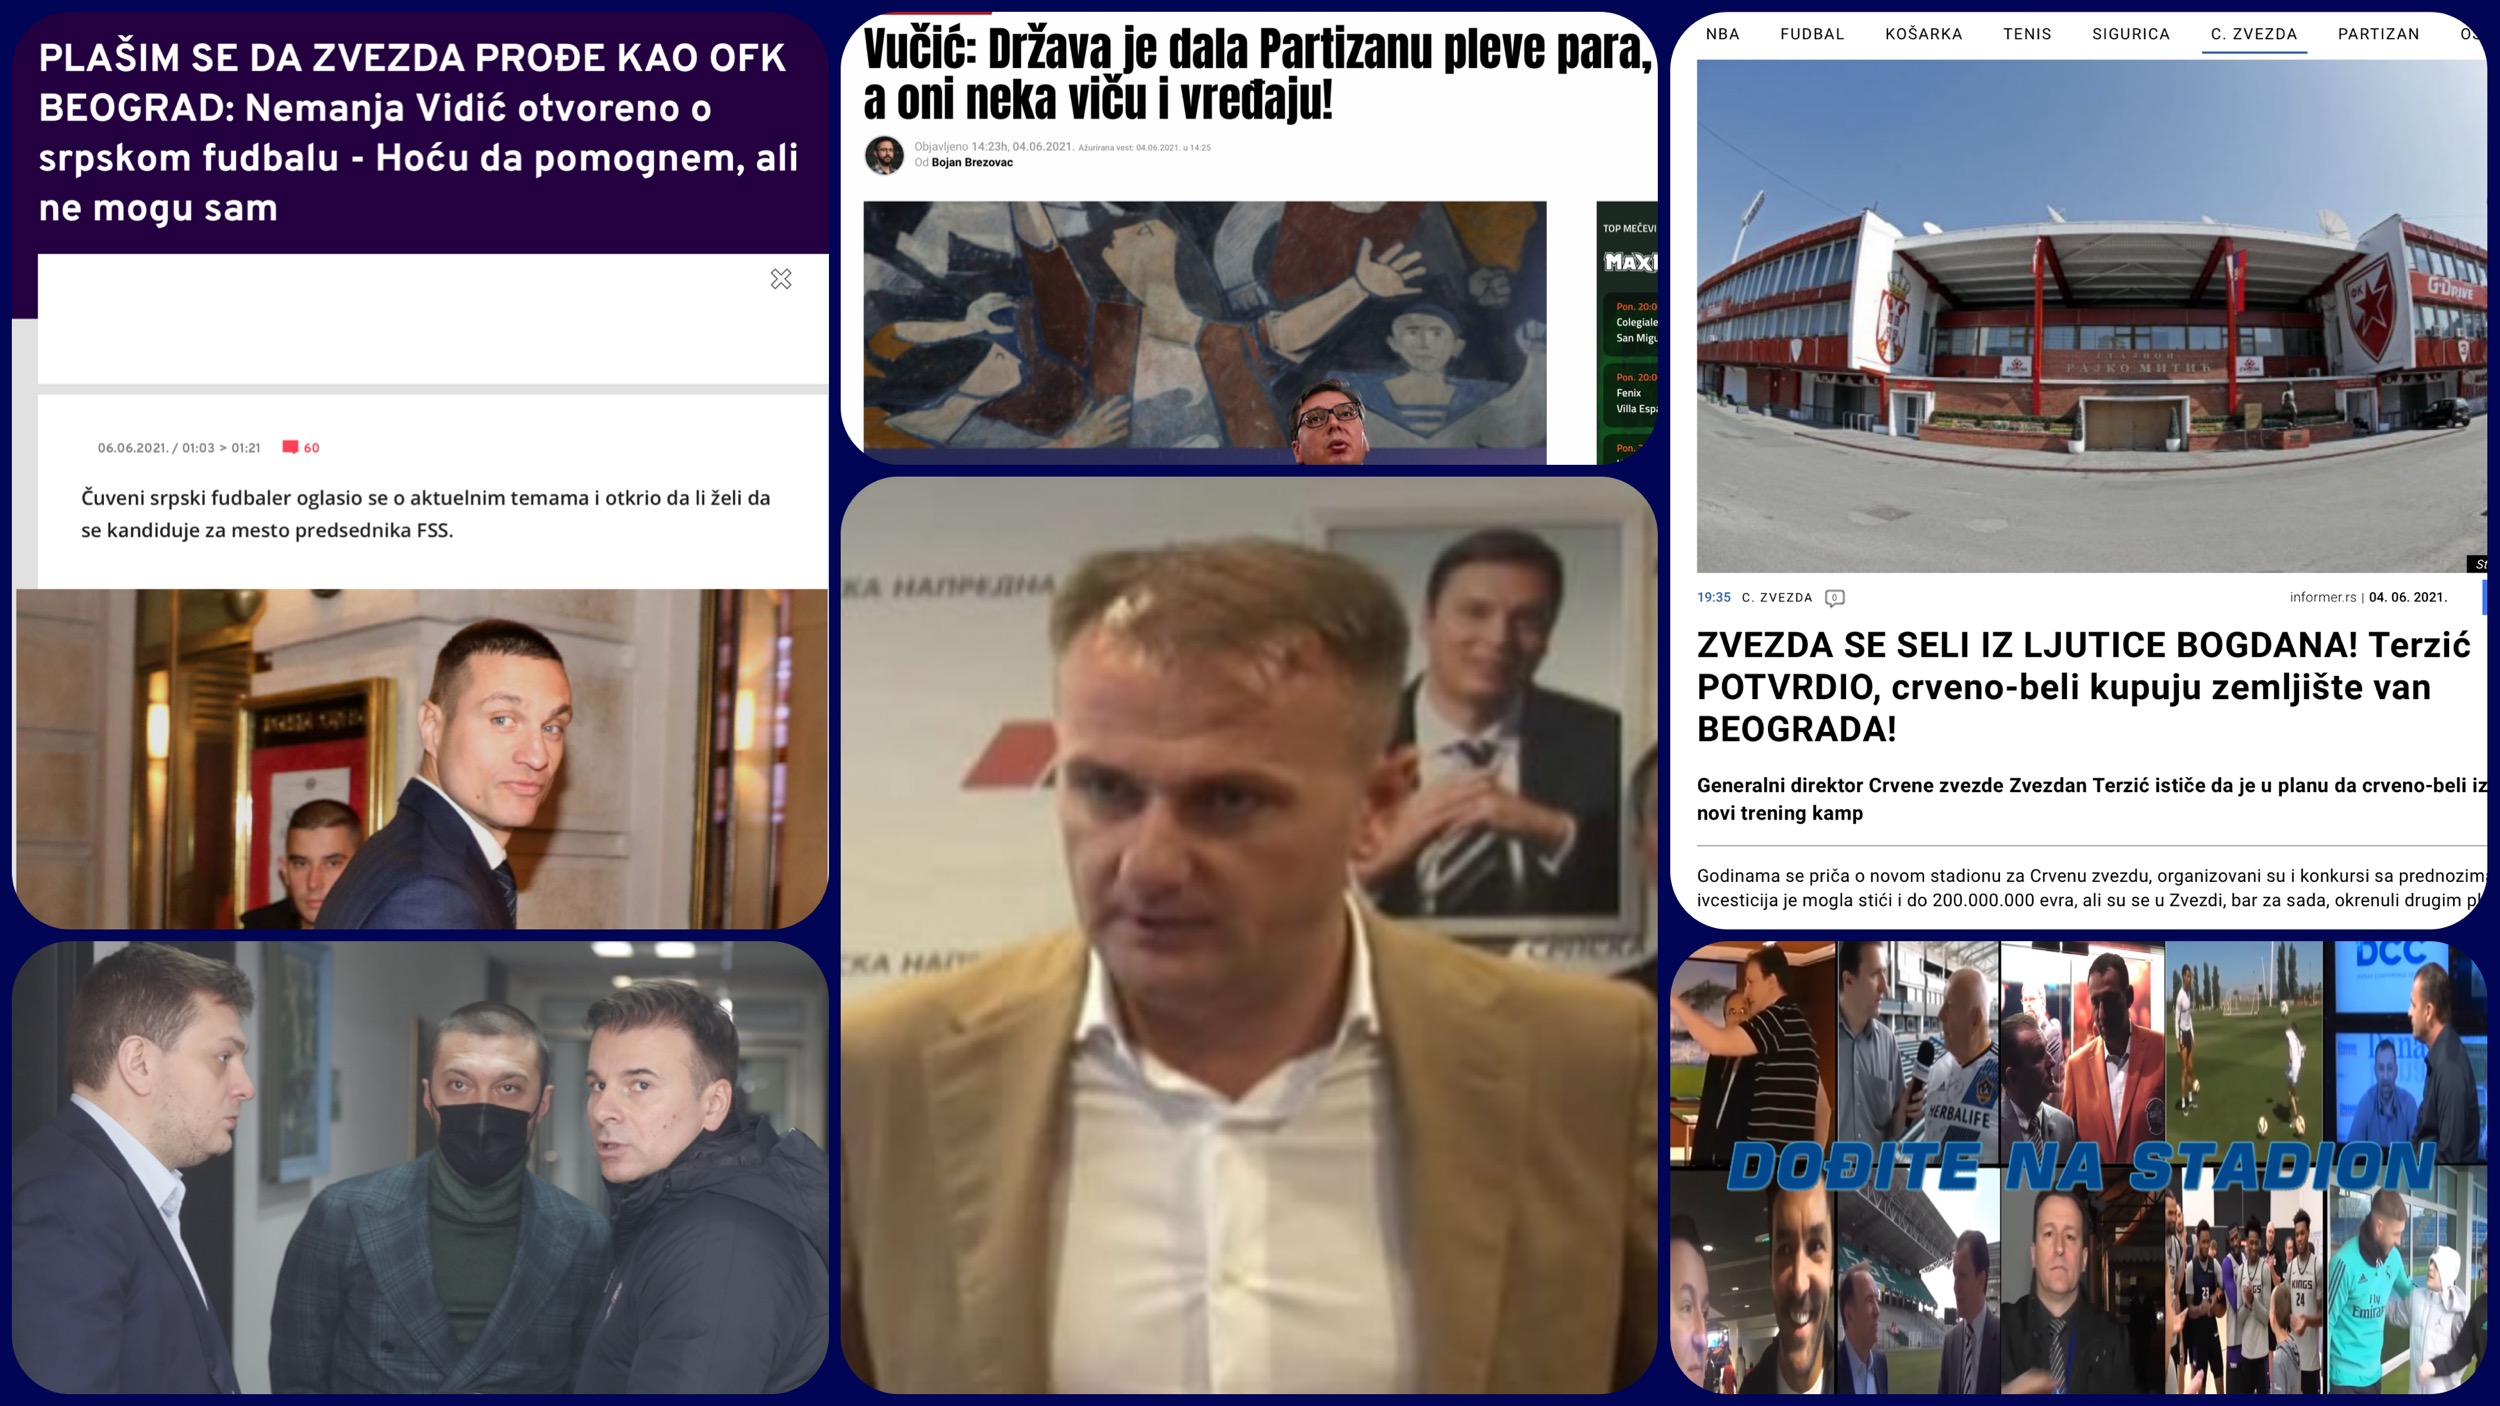 Dođite na stadion broj 423. Vučićeva pleva za Partizan i novi šumski stadion Crvene zvezde (VIDEO)